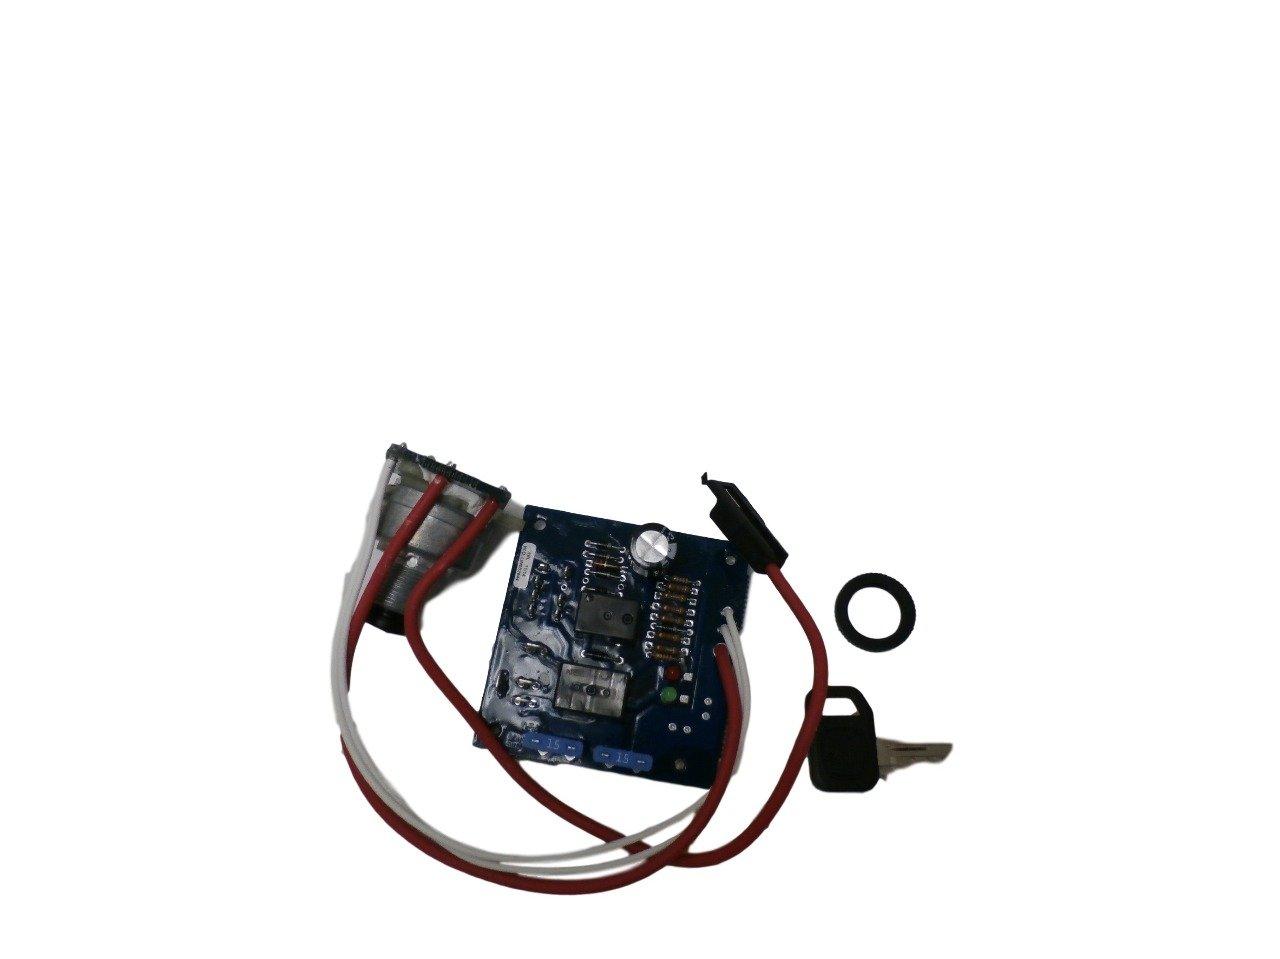 John Deere key switch Ignition Module with key 425 445 455 415 AM136681 AM131841